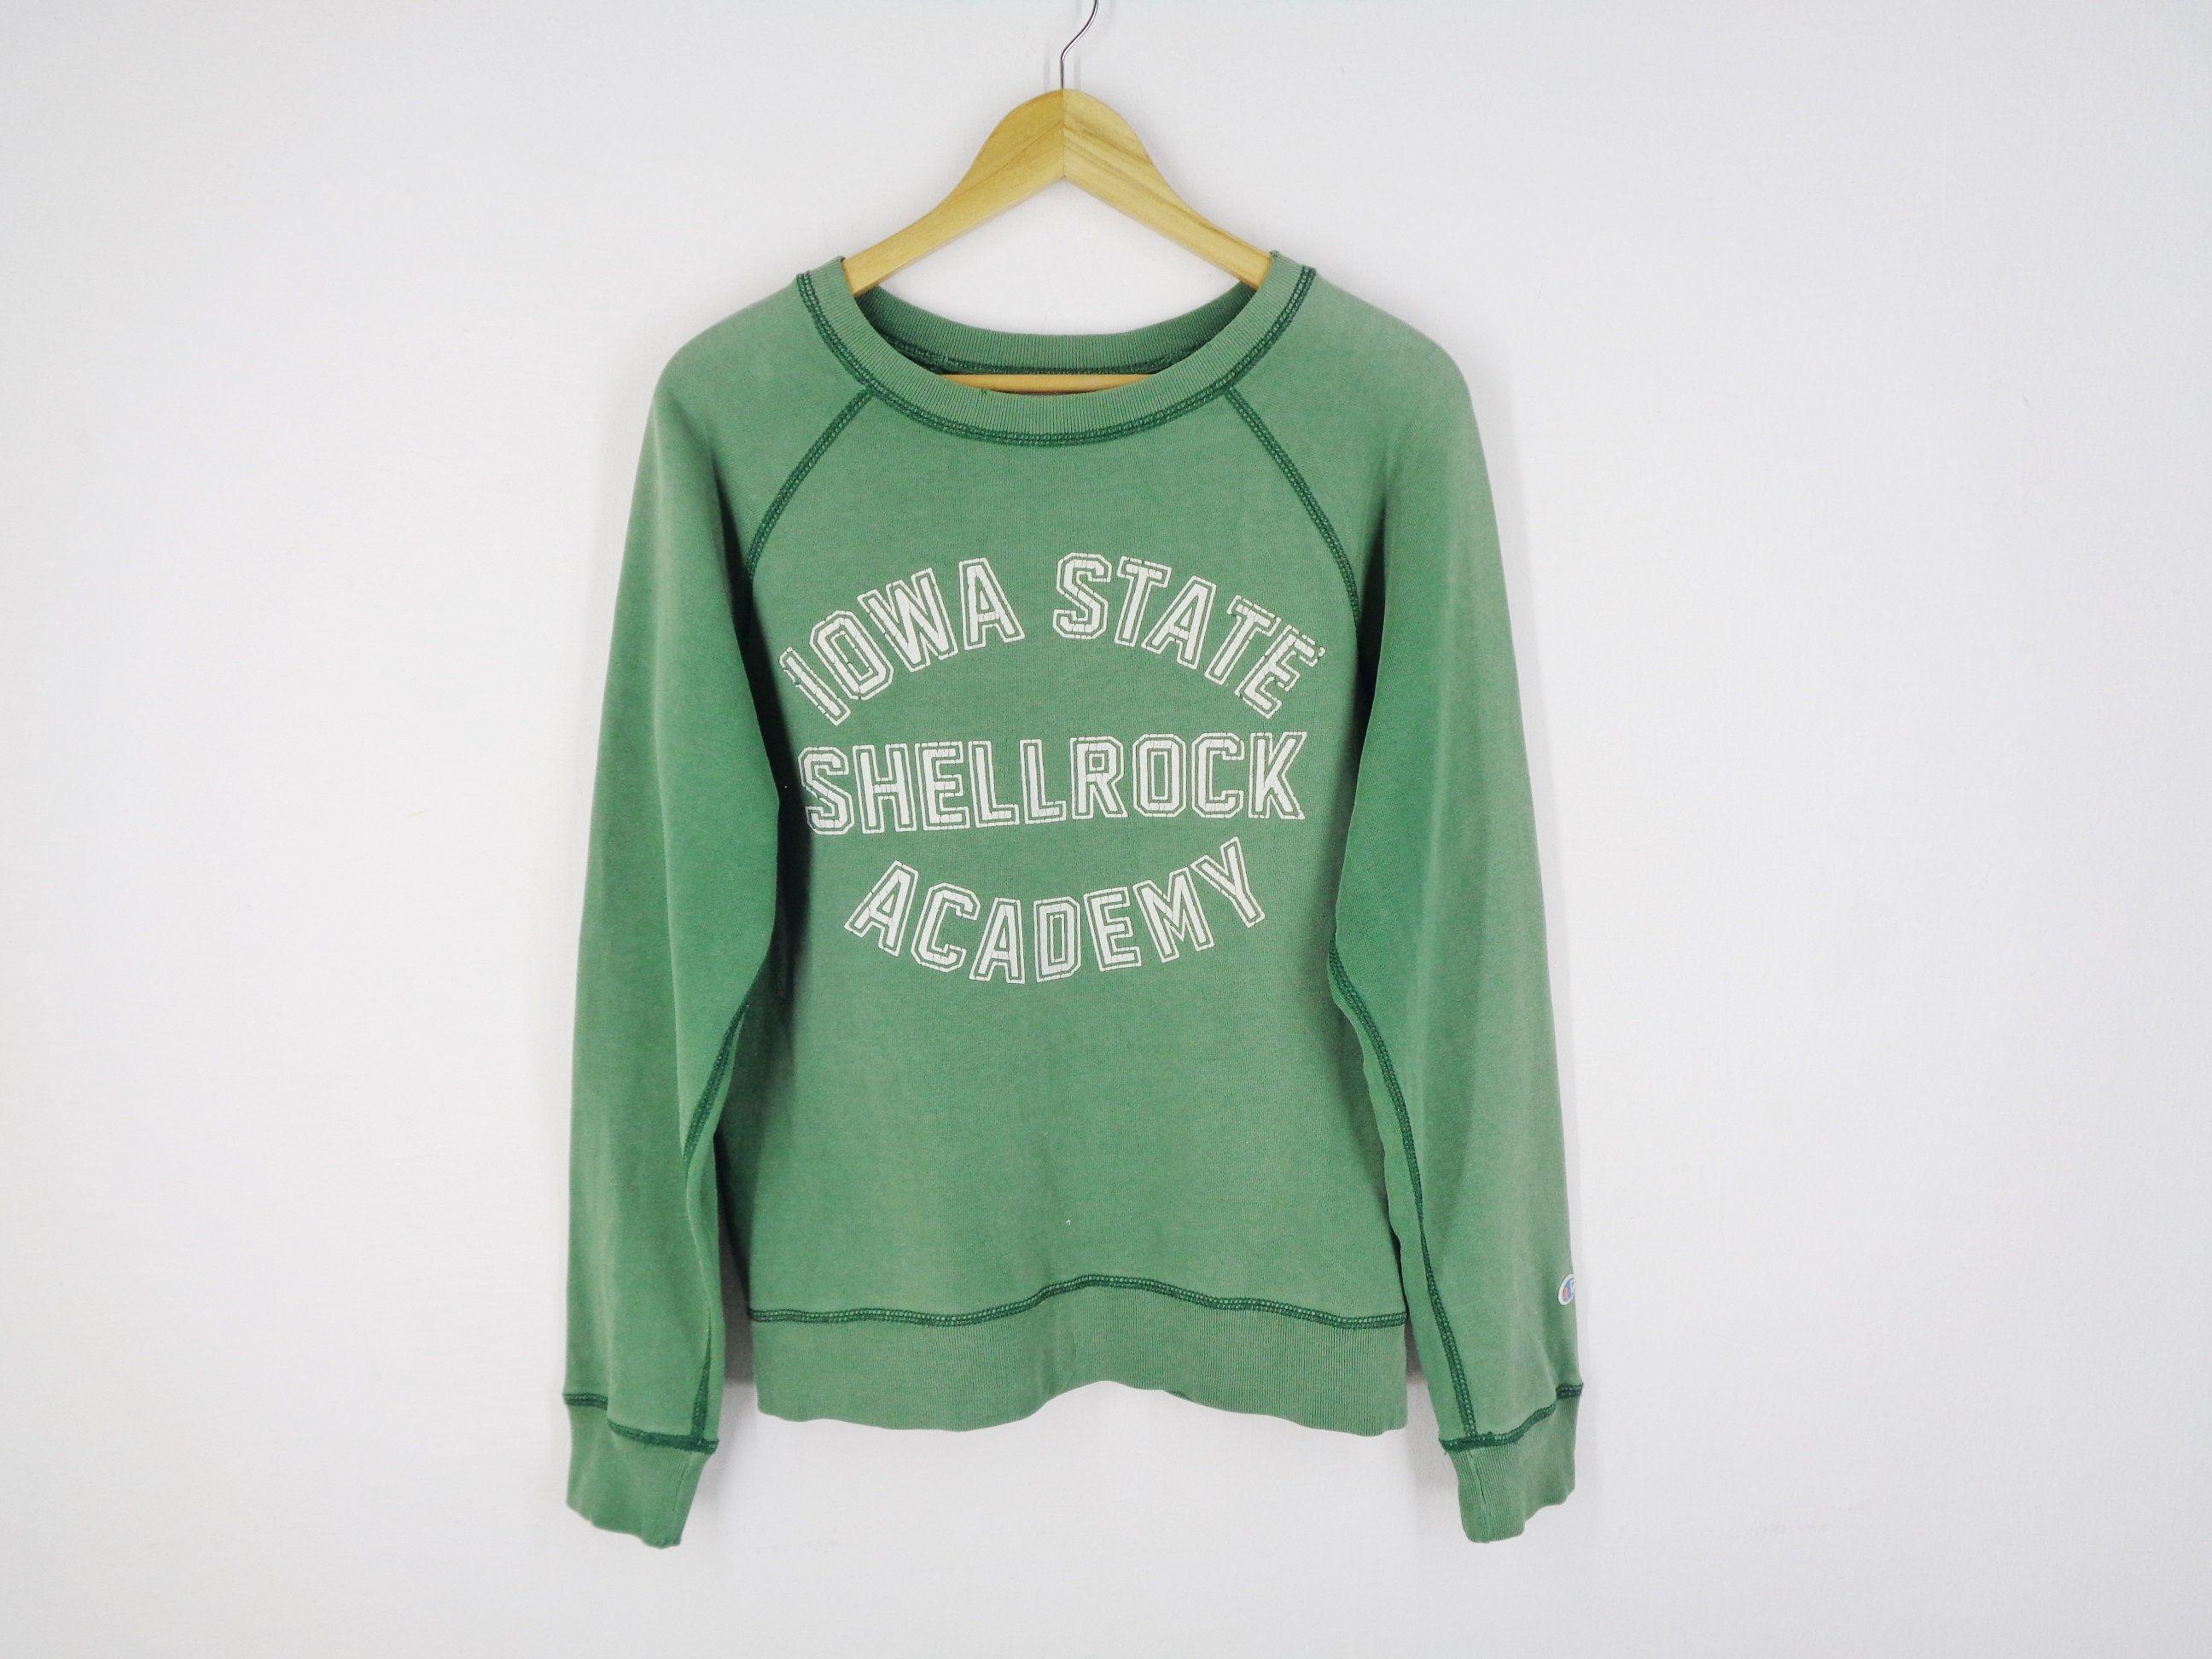 Champion Sweatshirt Distressed Vintage Champion Iowa State Etsy Champion Sweatshirt Sweatshirts Vintage Champion [ 1944 x 2592 Pixel ]